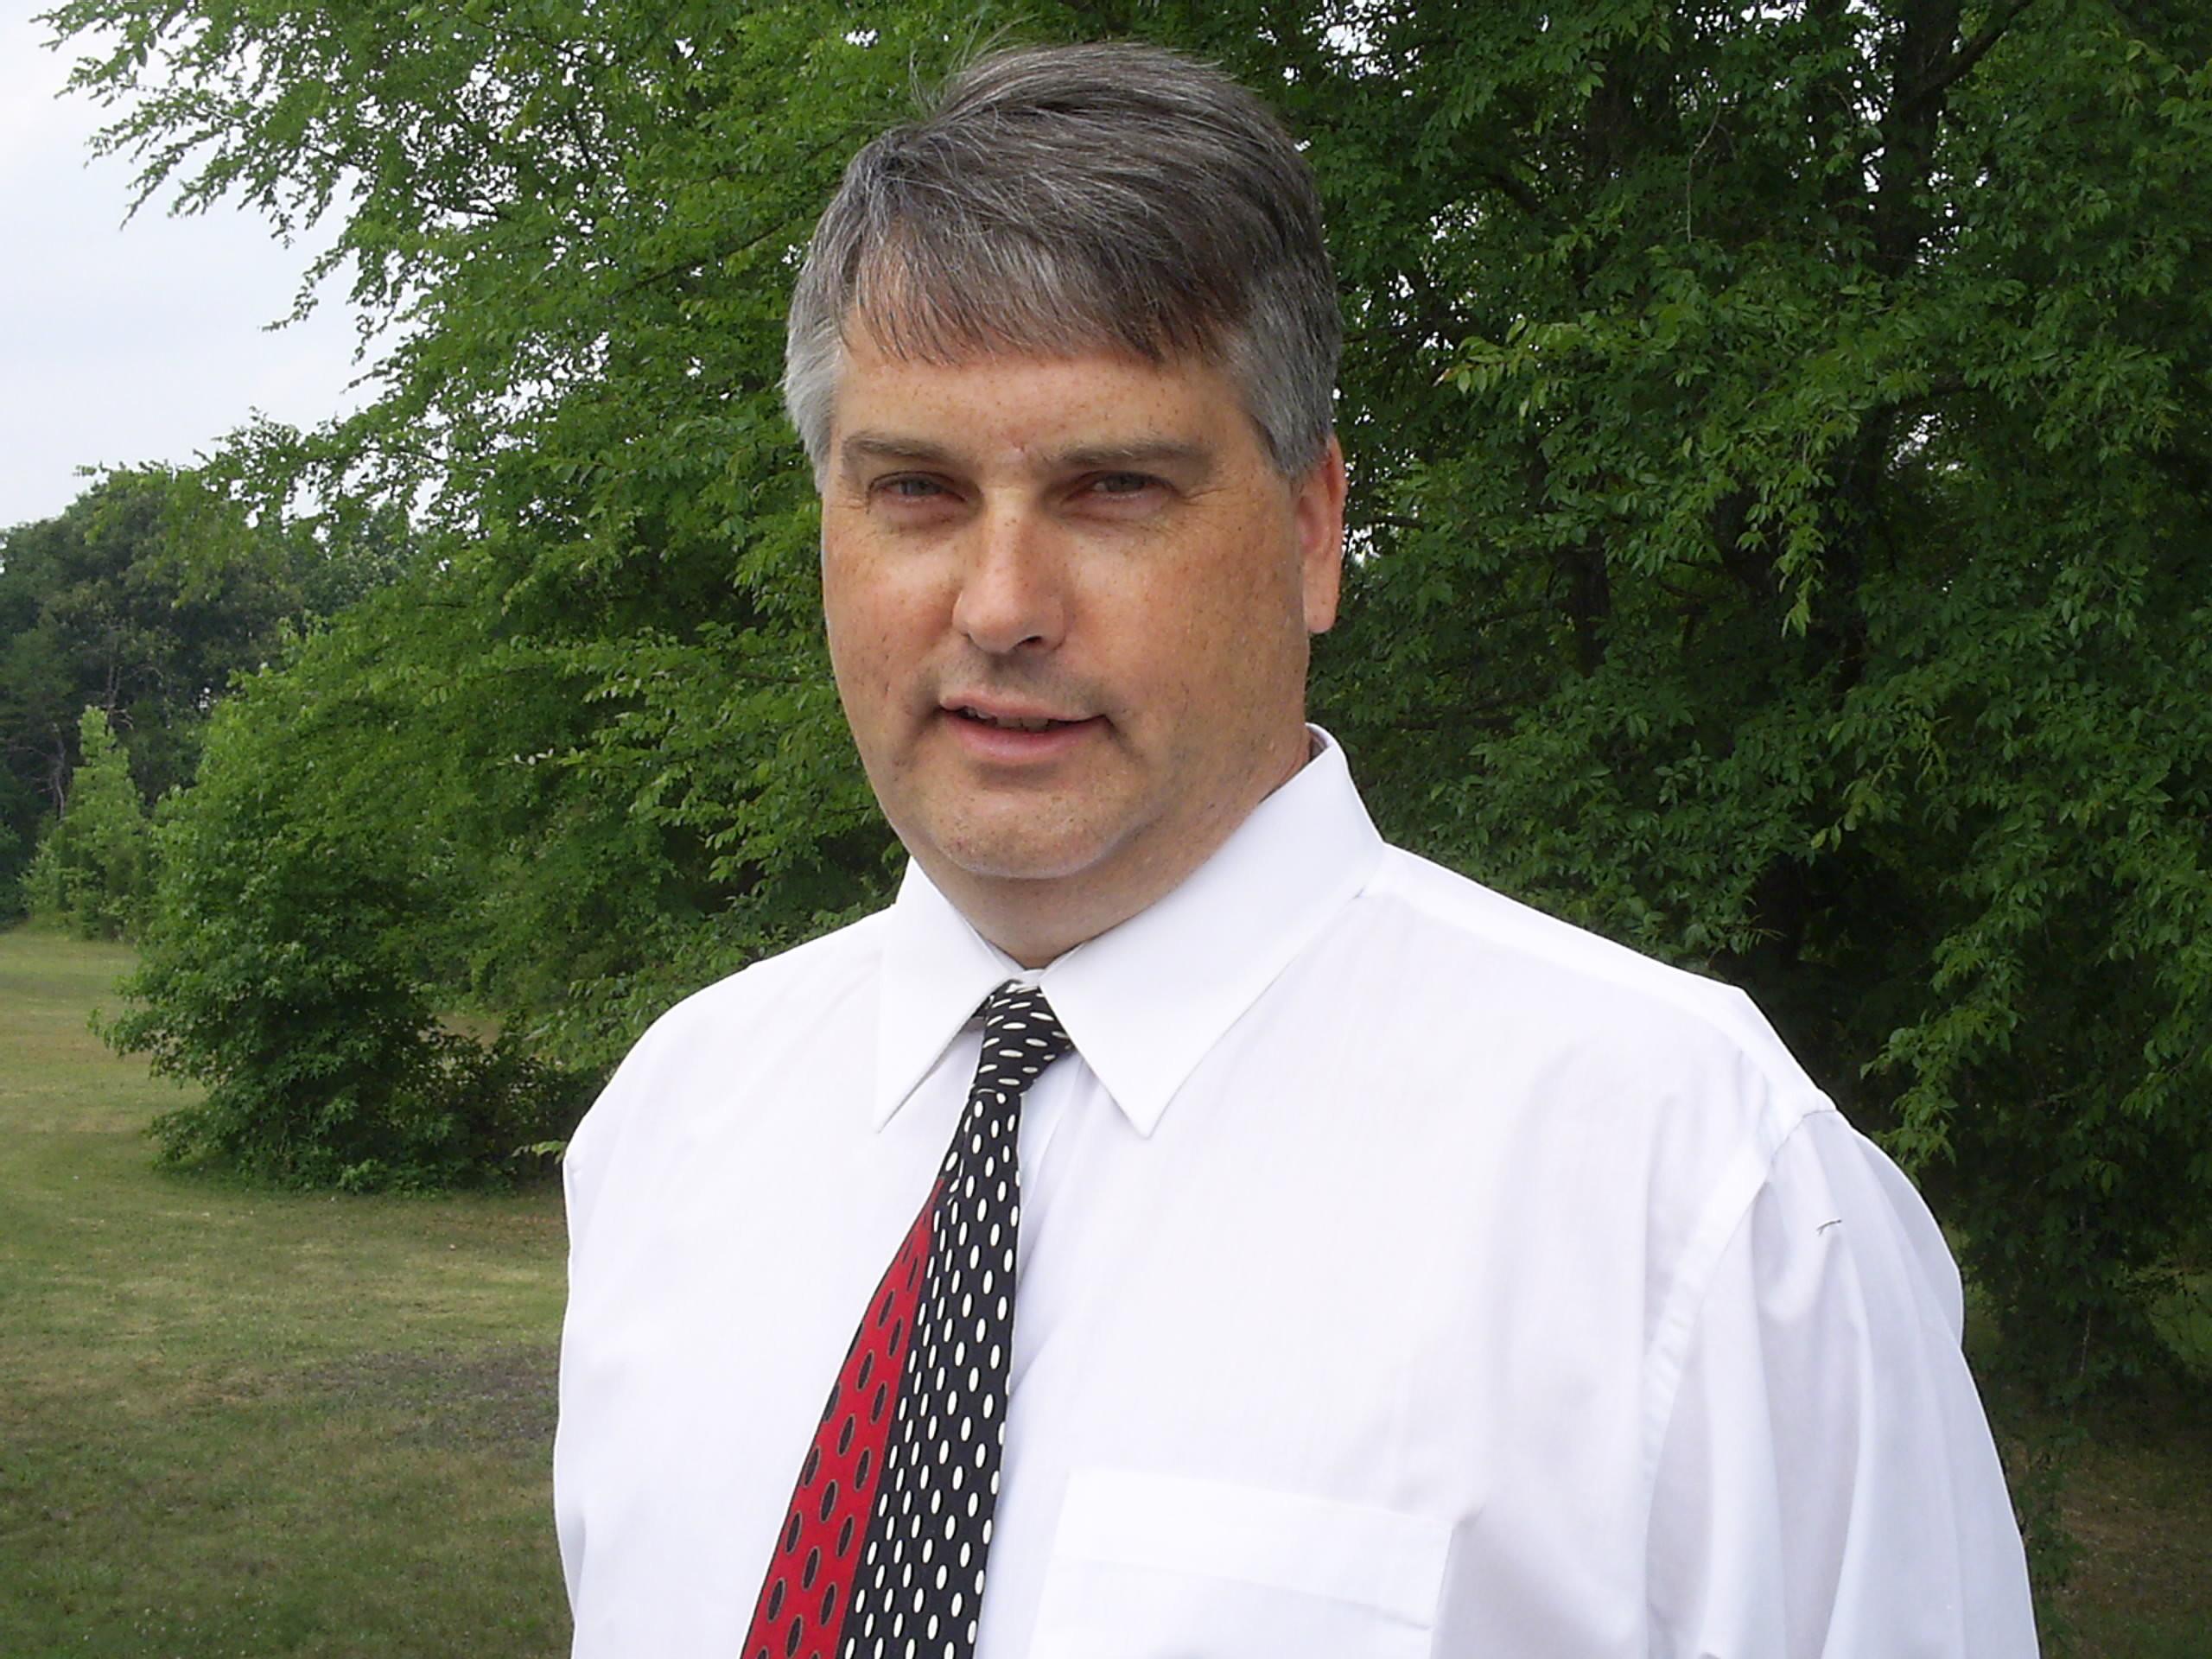 Kirk Hanson, Concord Real Estate, License #: 235528